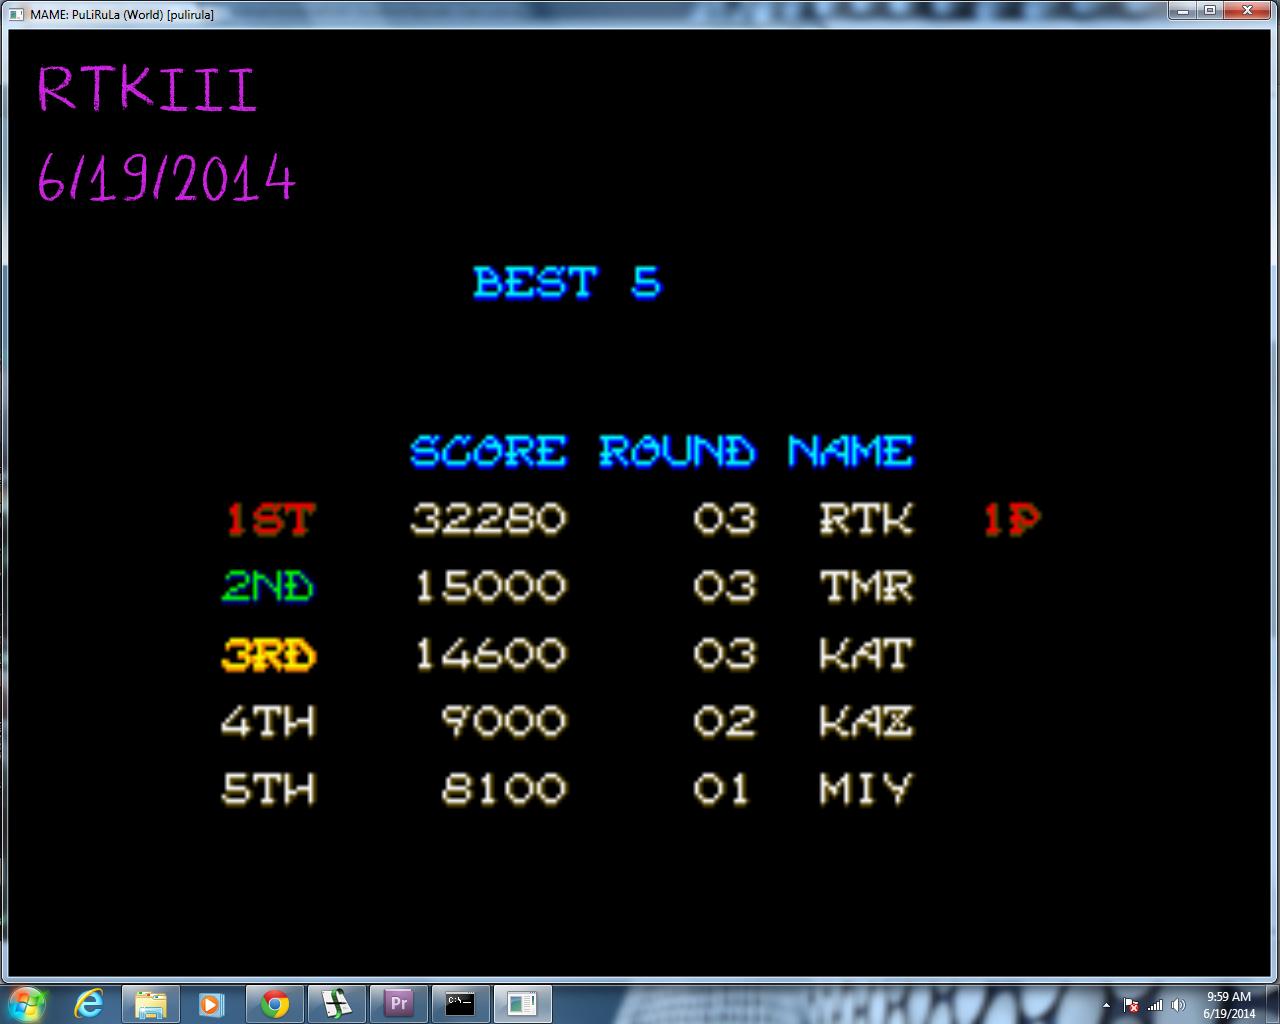 rtkiii: PuLiRuLa [pulirula] (Arcade Emulated / M.A.M.E.) 32,280 points on 2014-06-19 09:02:07